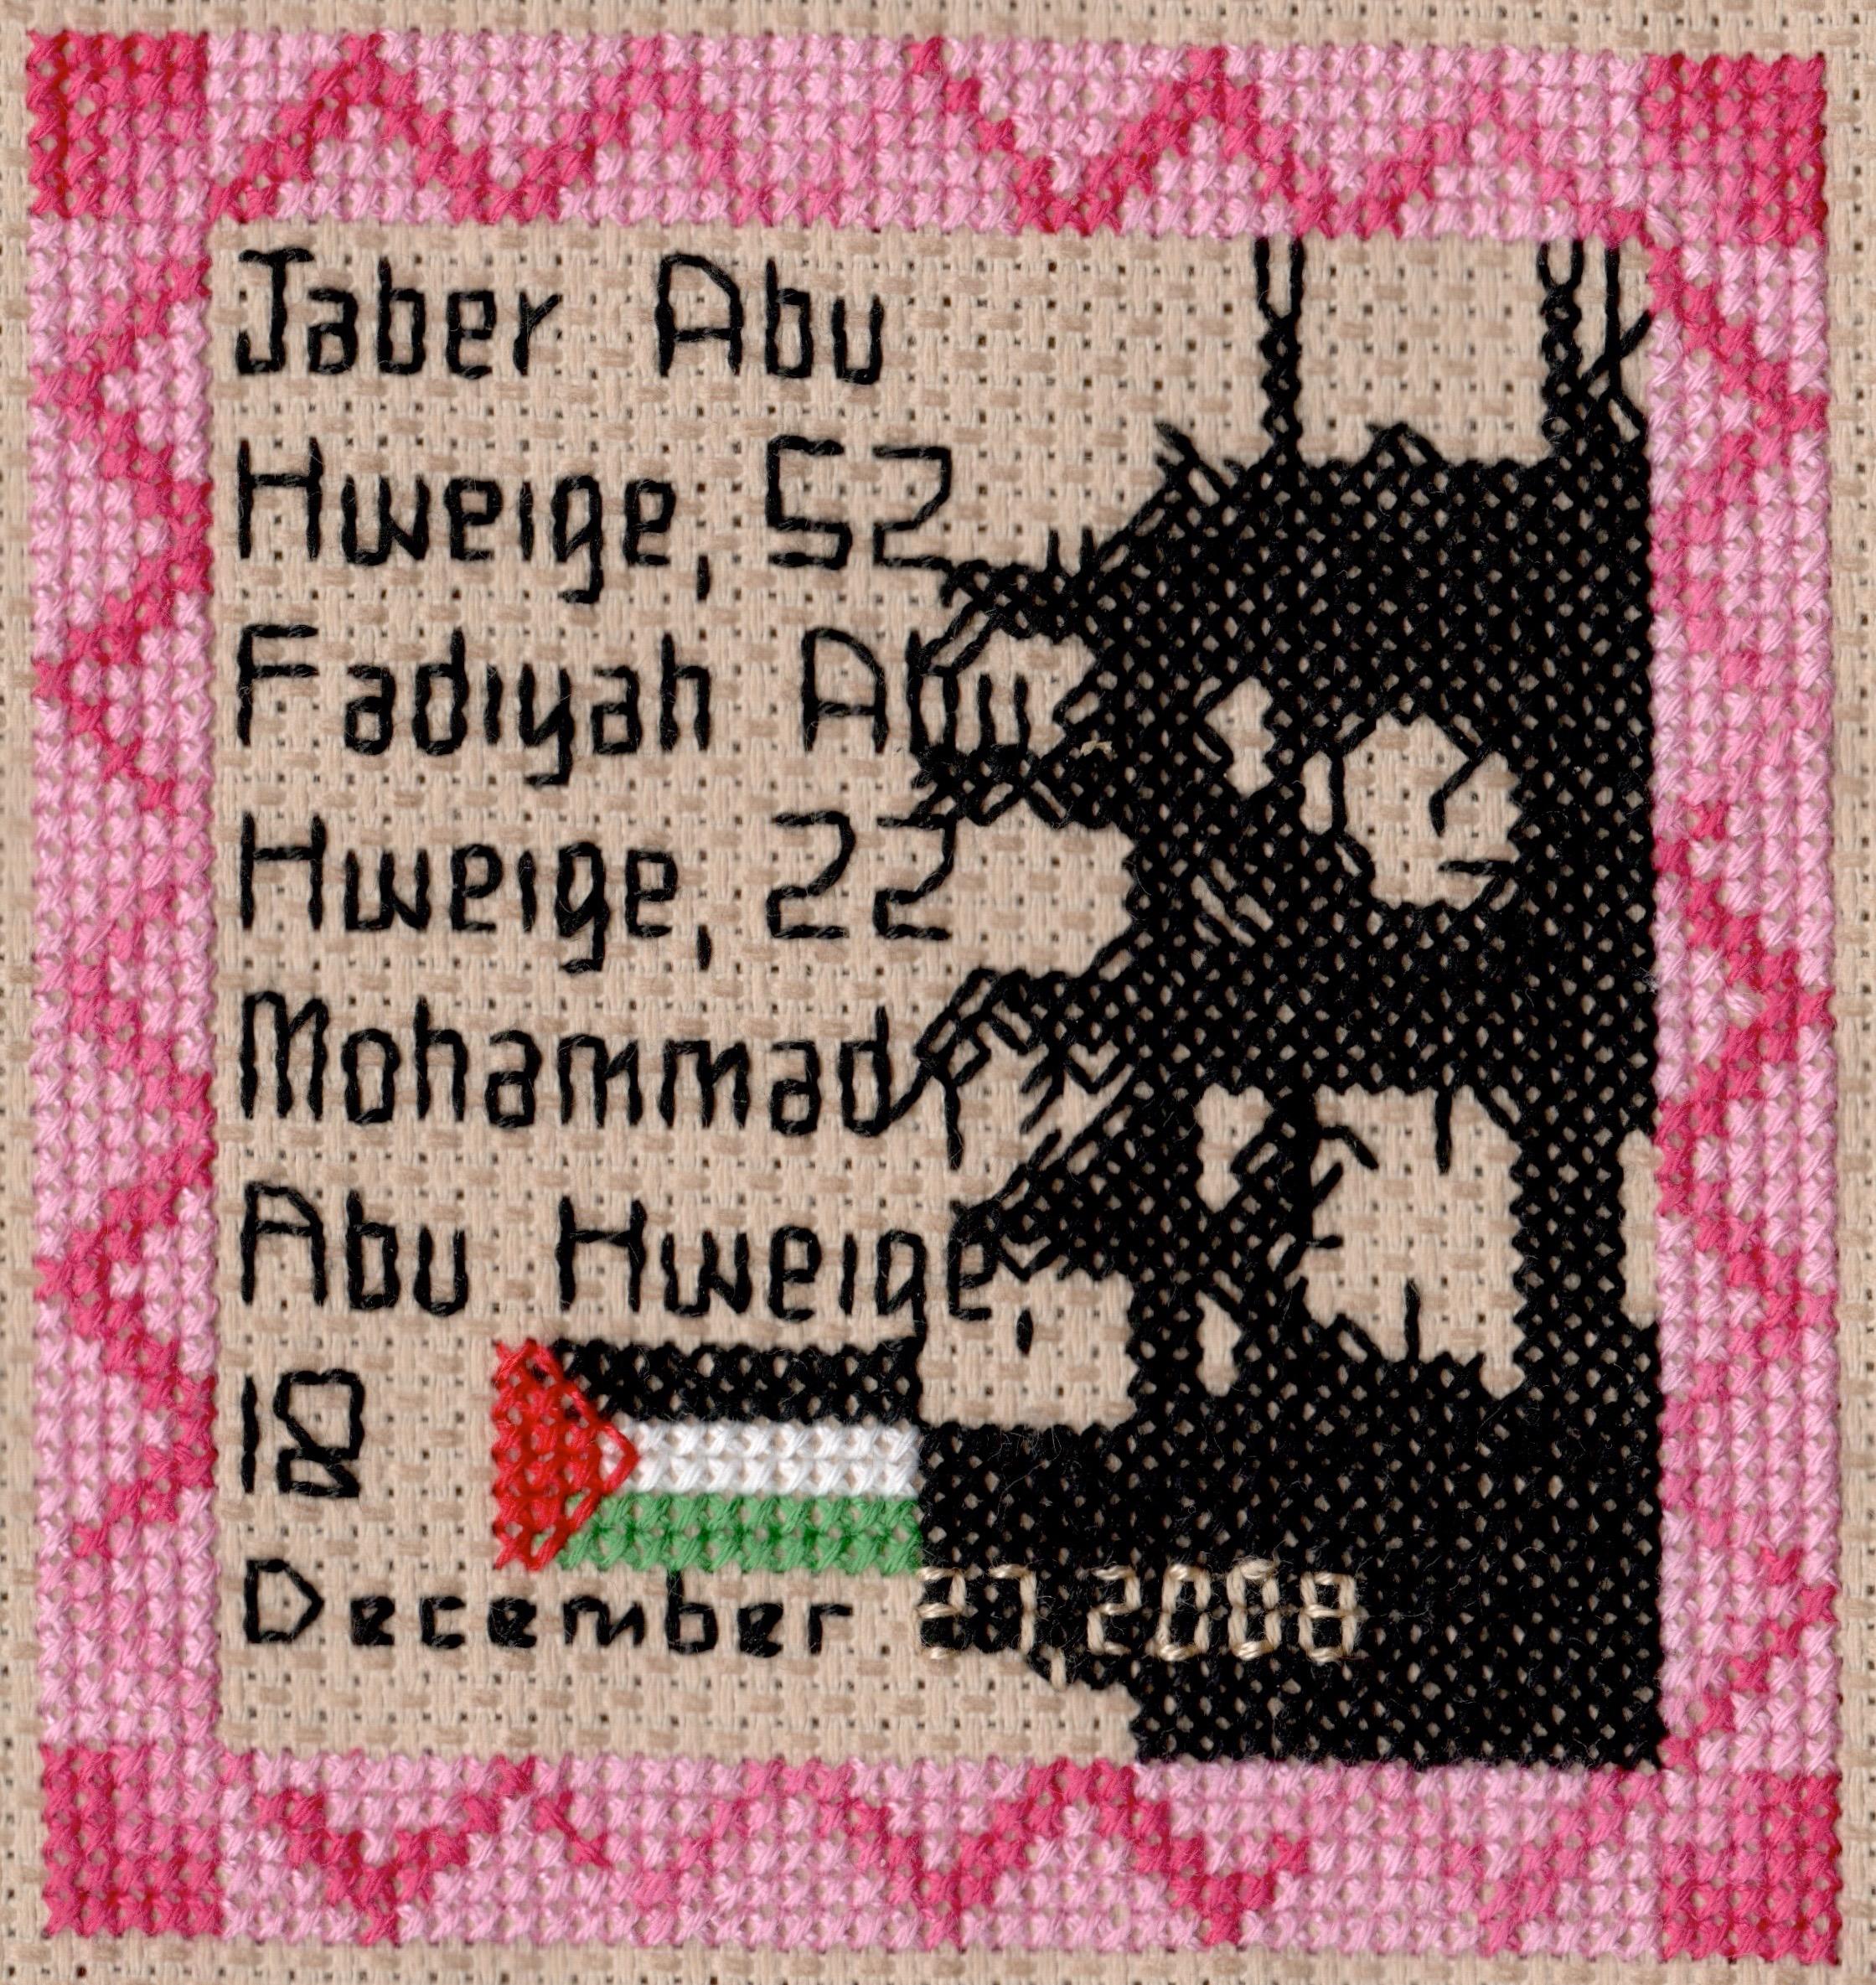 24 Jaber, Fadiyah & Mohammad